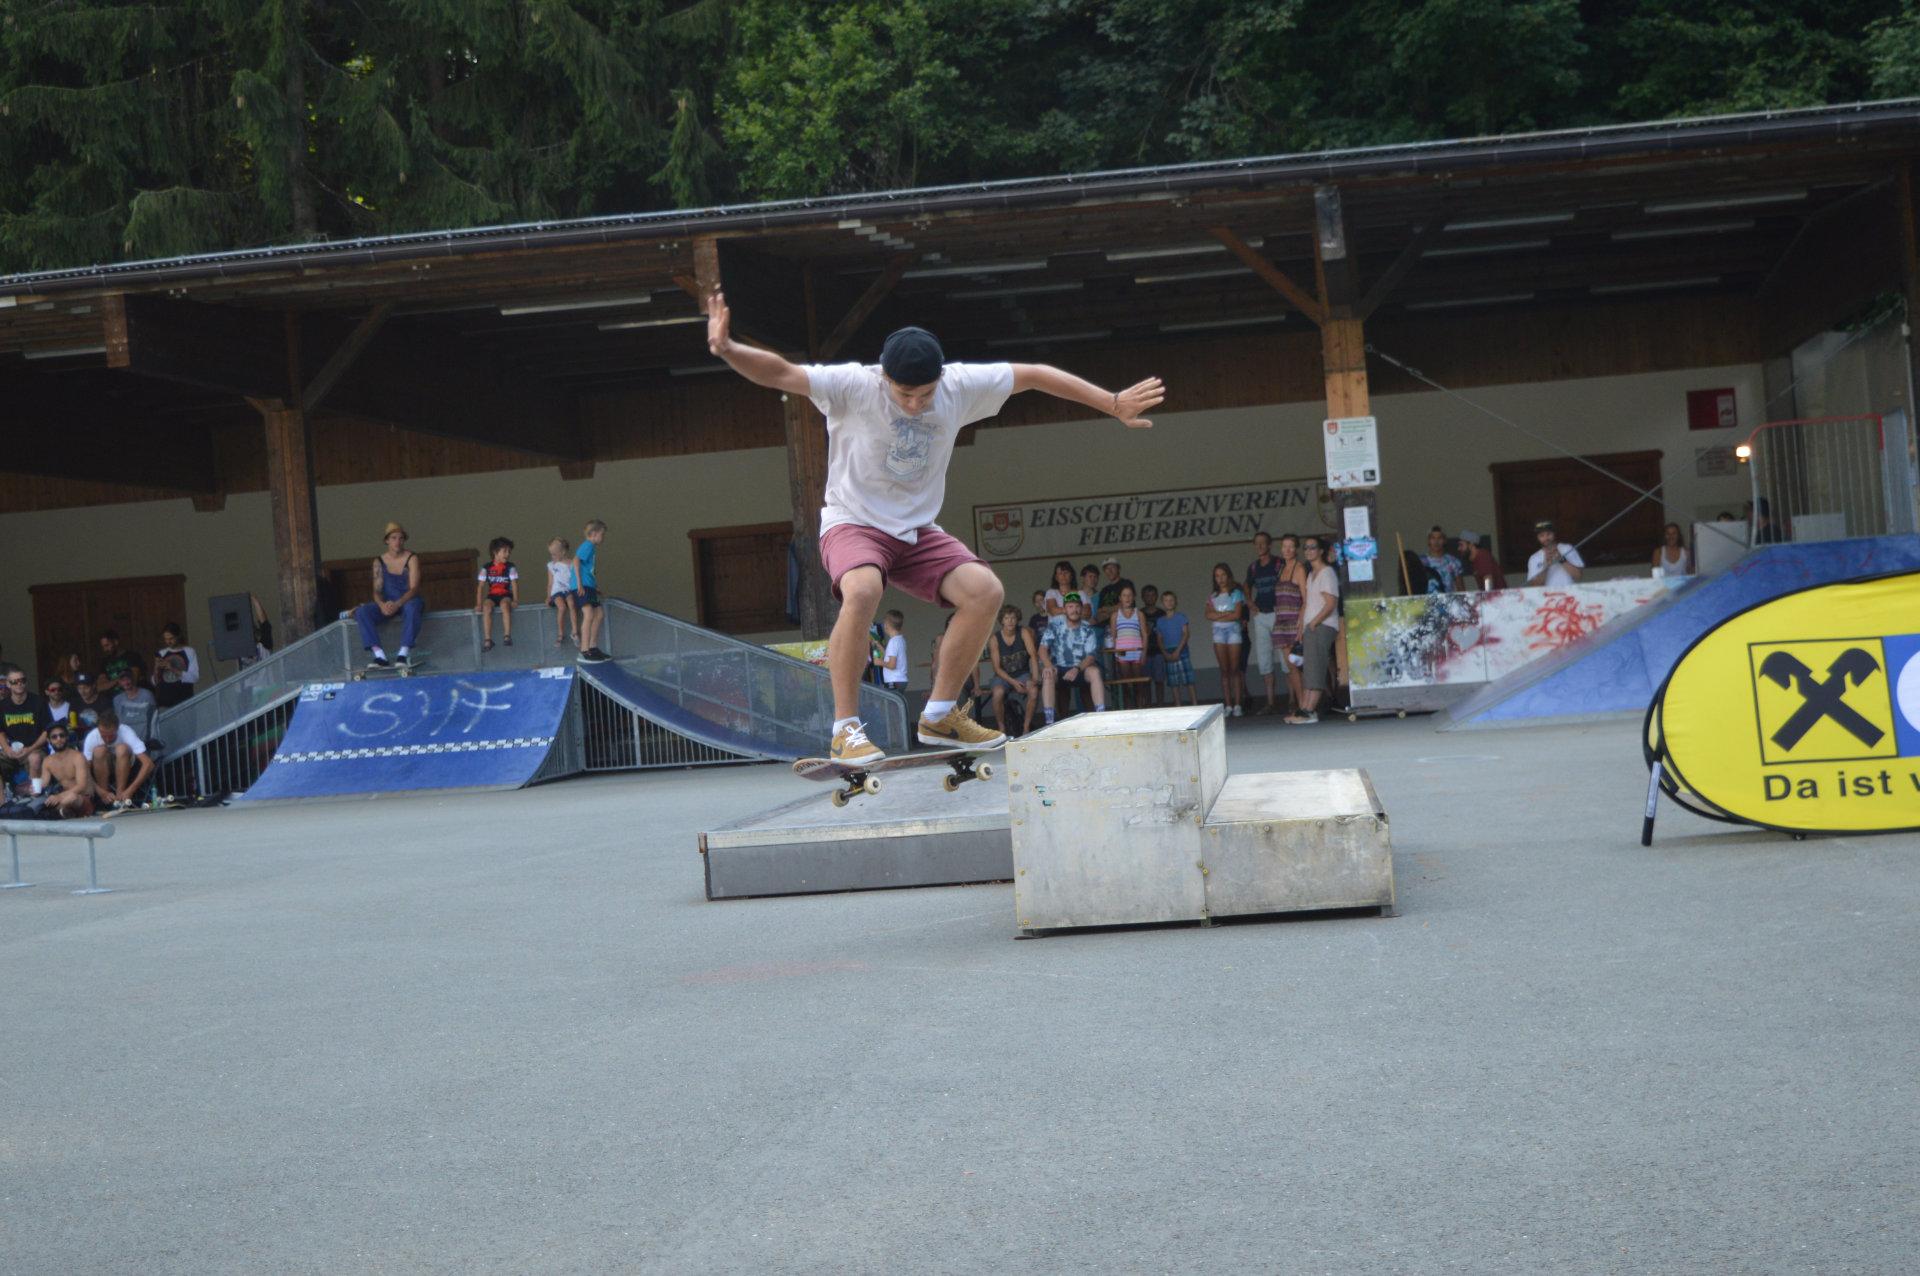 skateboardheadz fieberbrunn kitzgau trophy finale 2018 fieberbrunn 00125